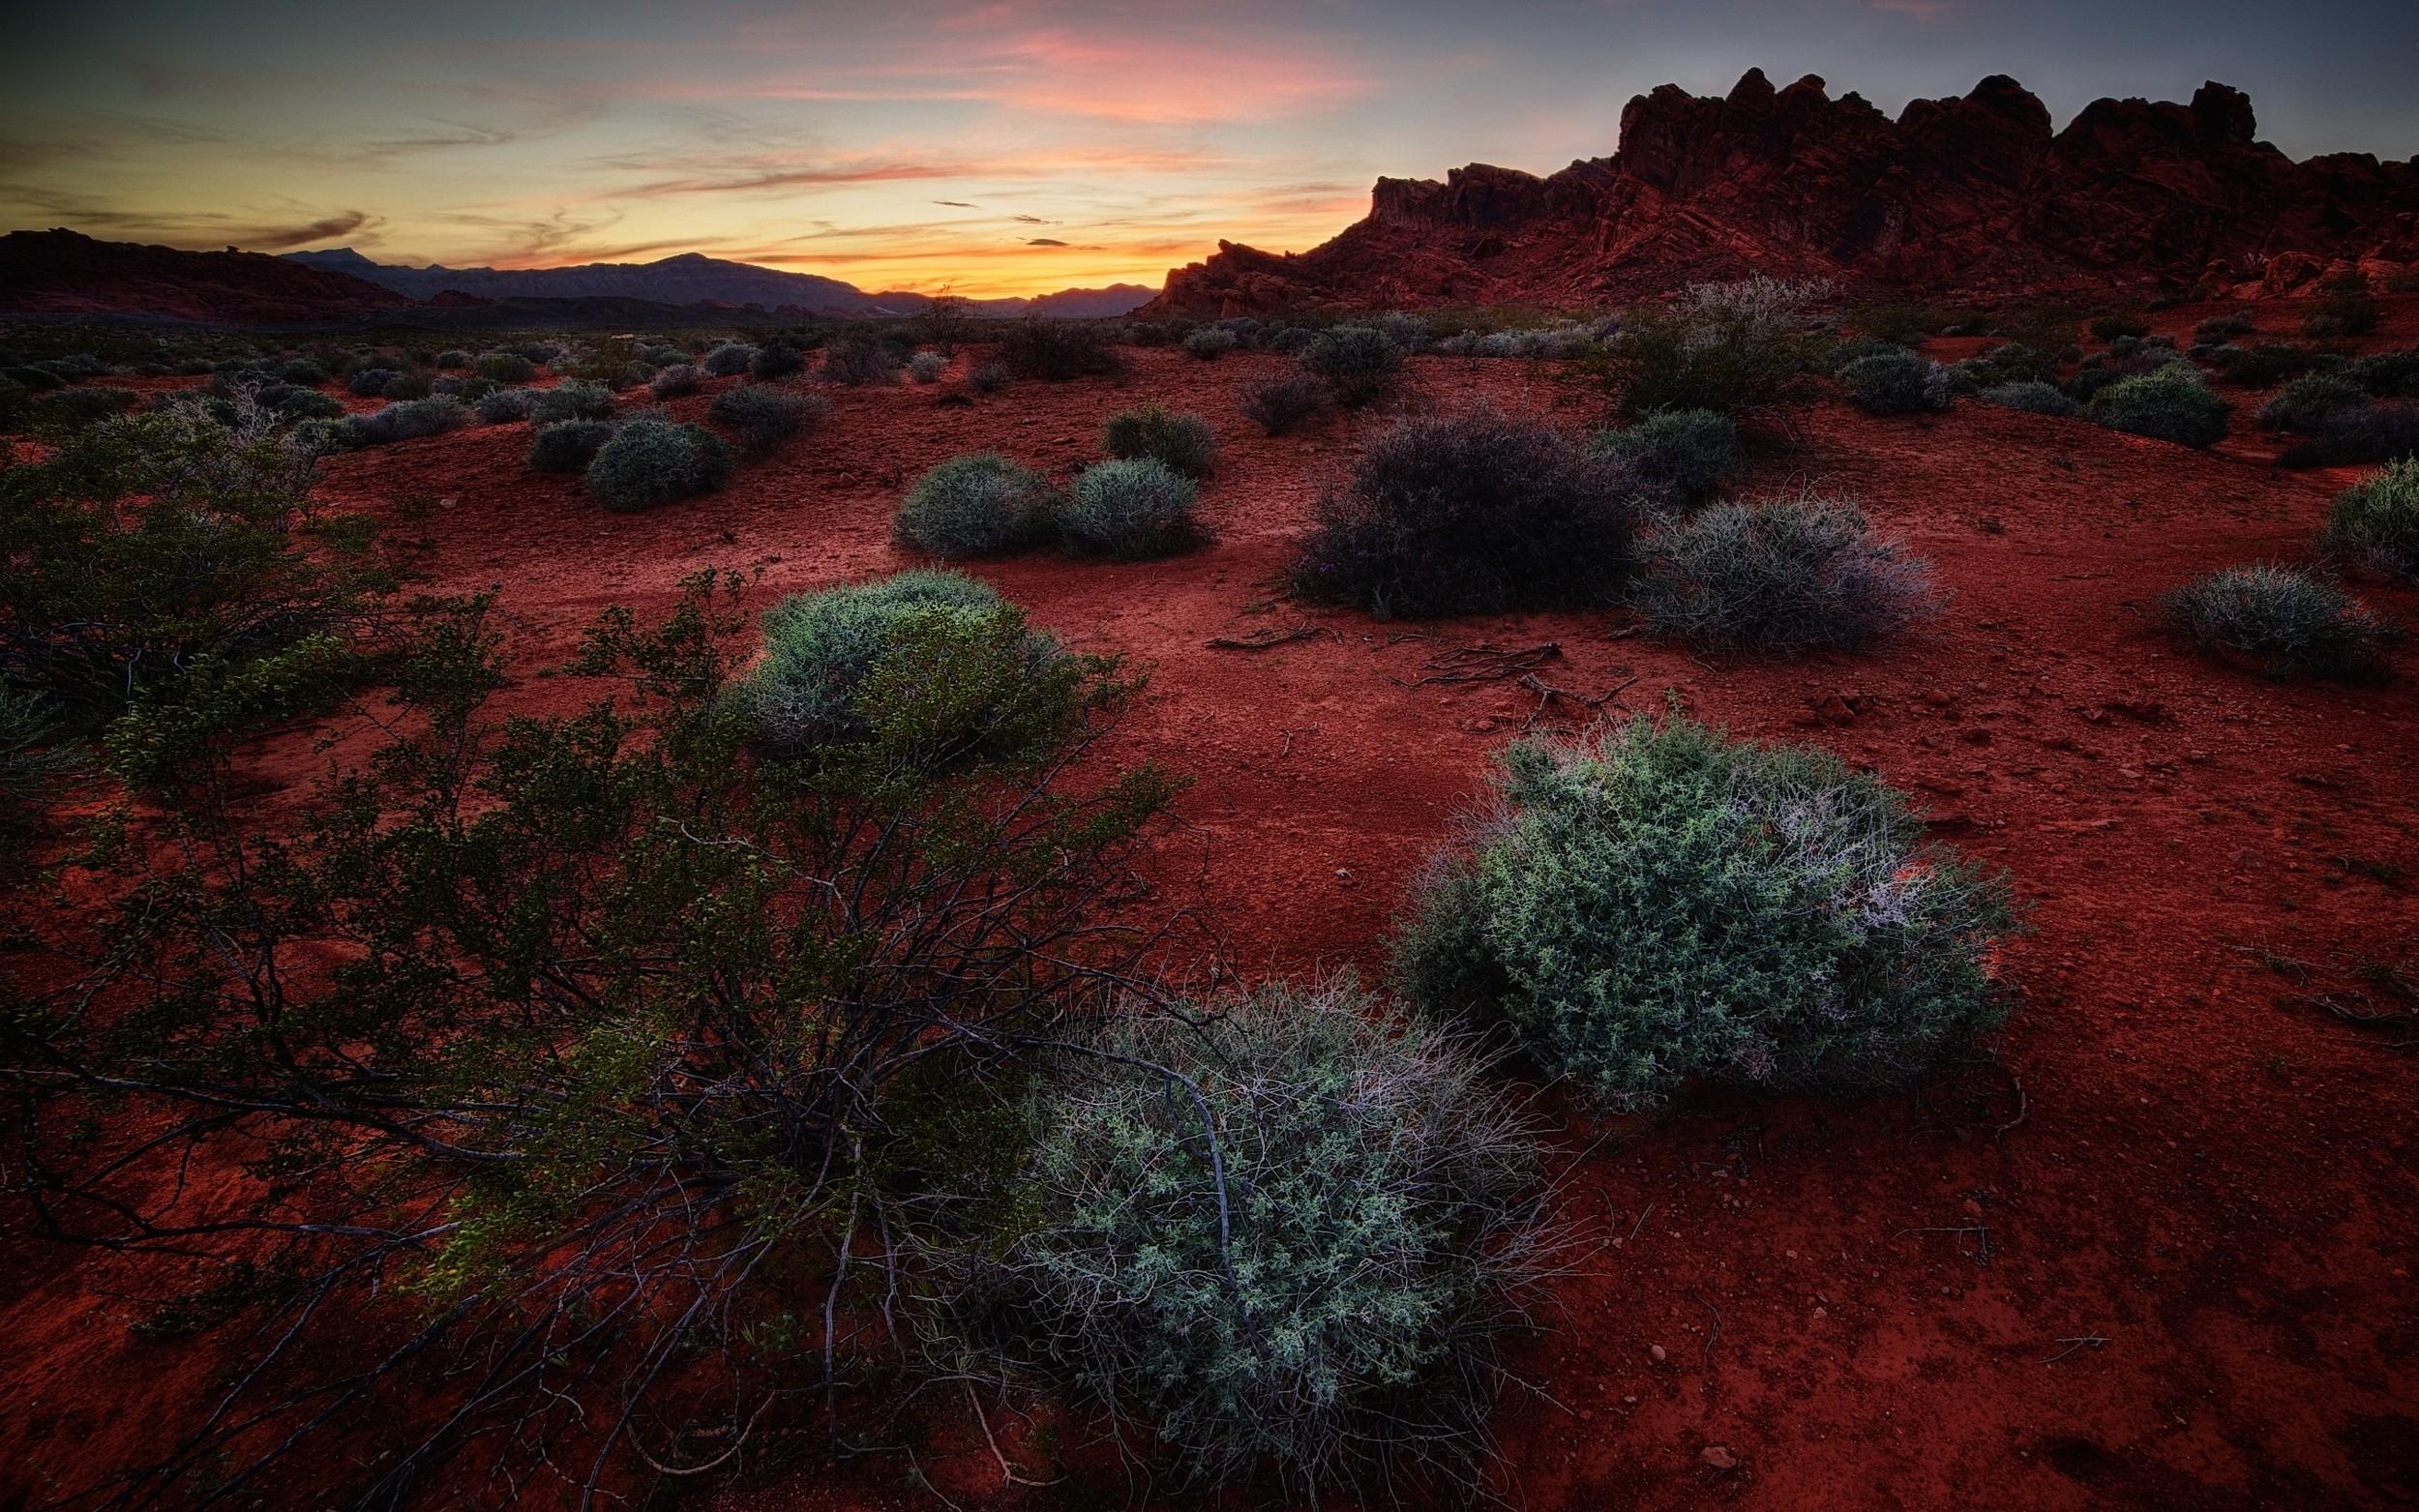 General 2500x1563 nature landscape sunset shrubs rock hills red steppe clouds desert